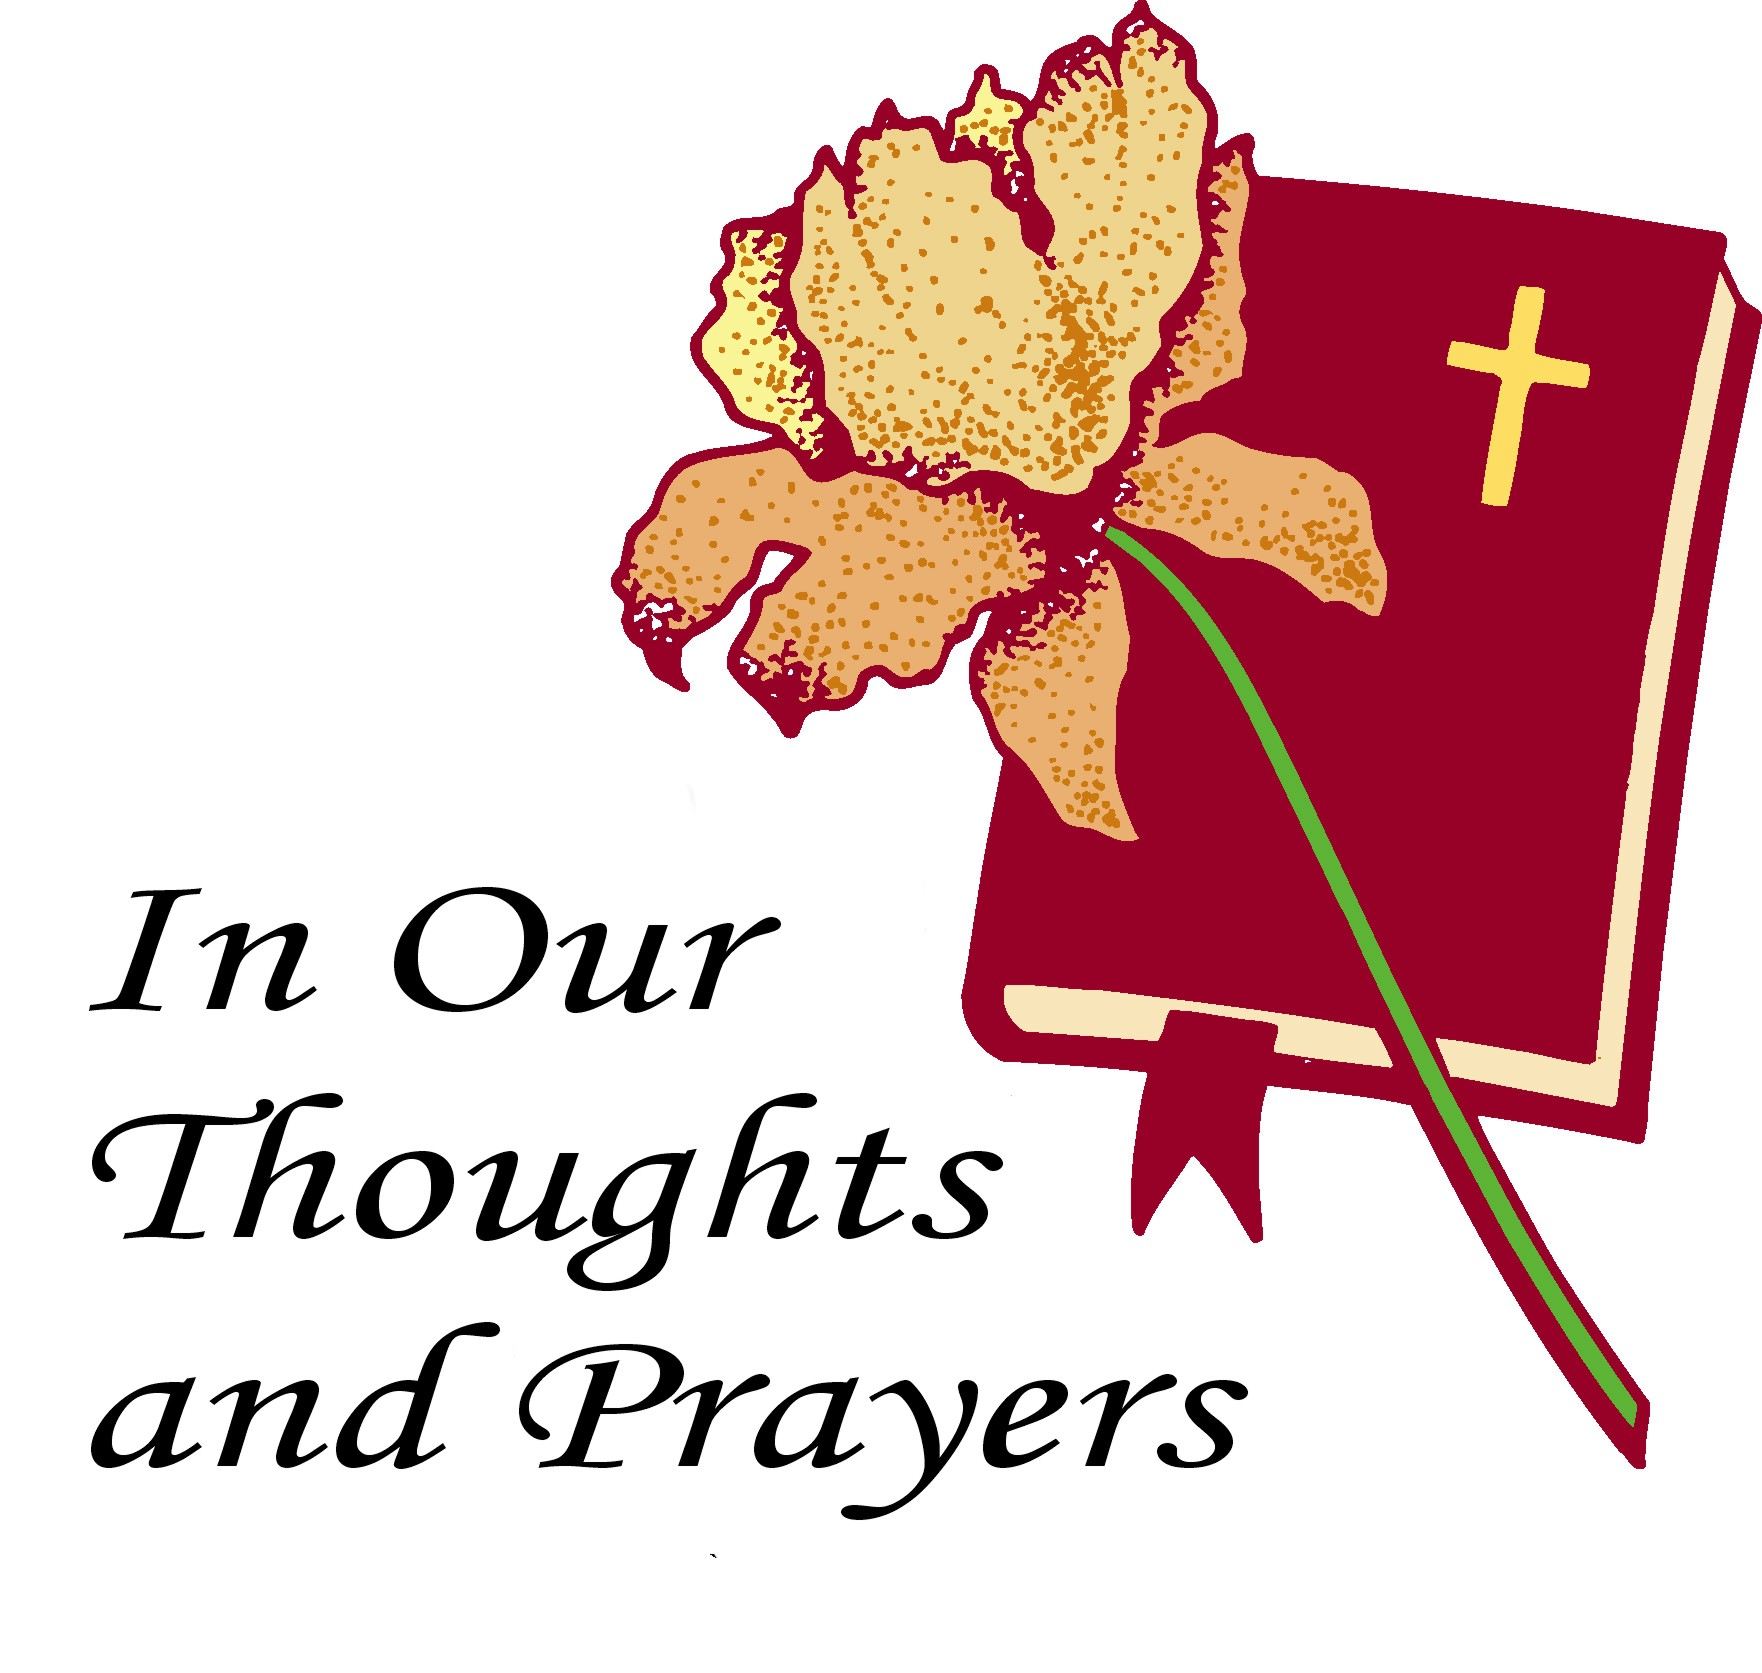 group prayer clipart